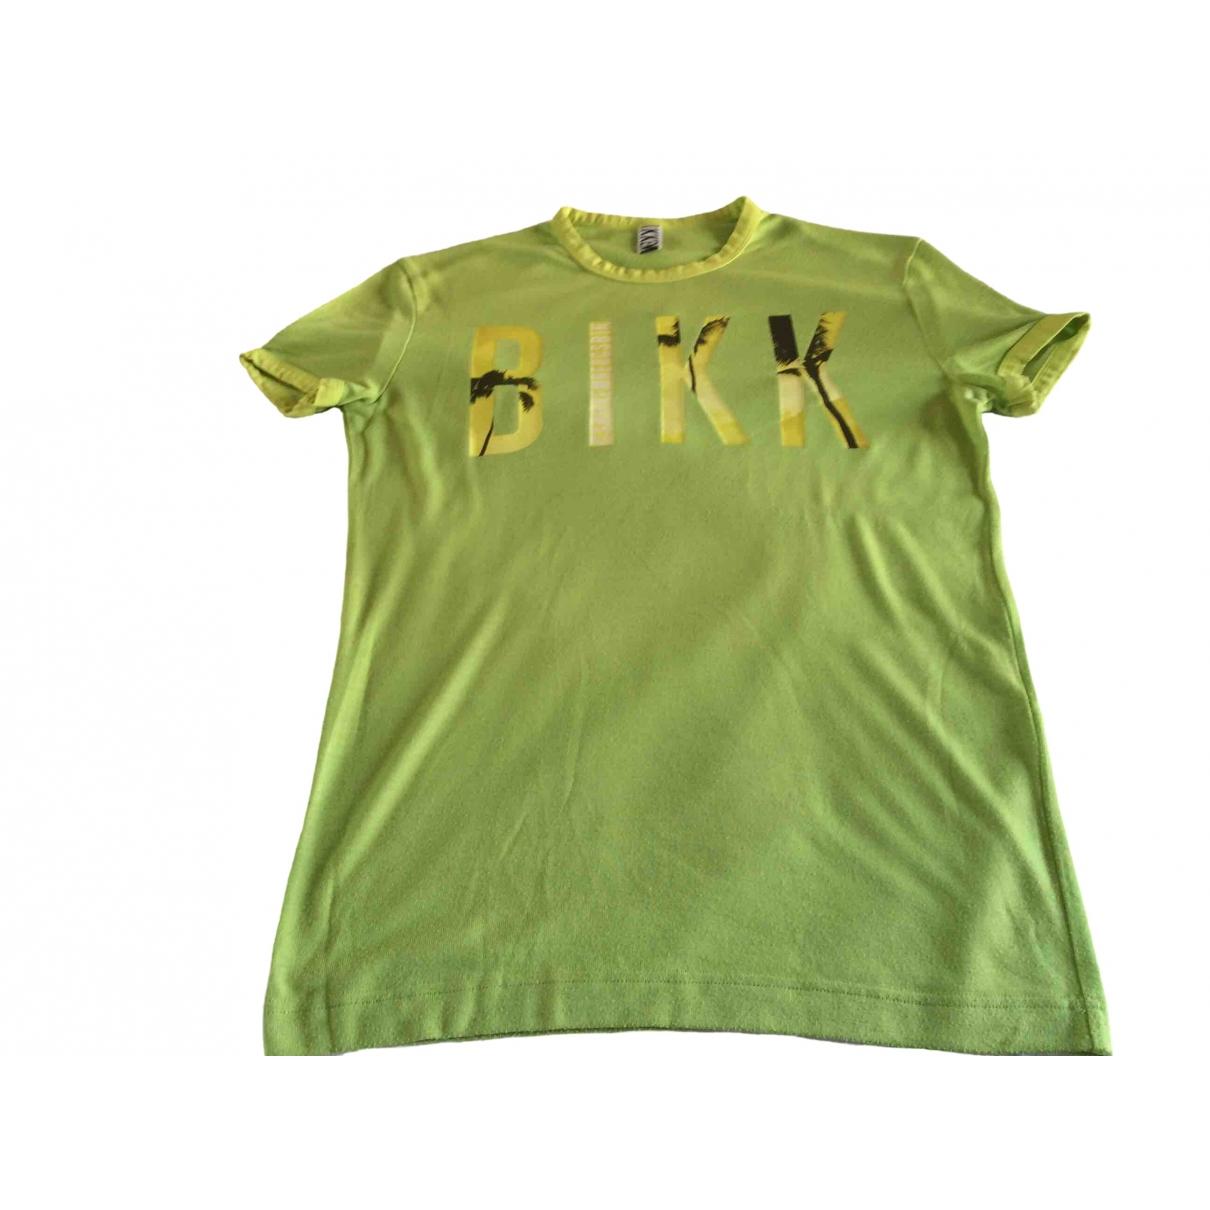 Dirk Bikkembergs \N Green T-shirts for Men M International